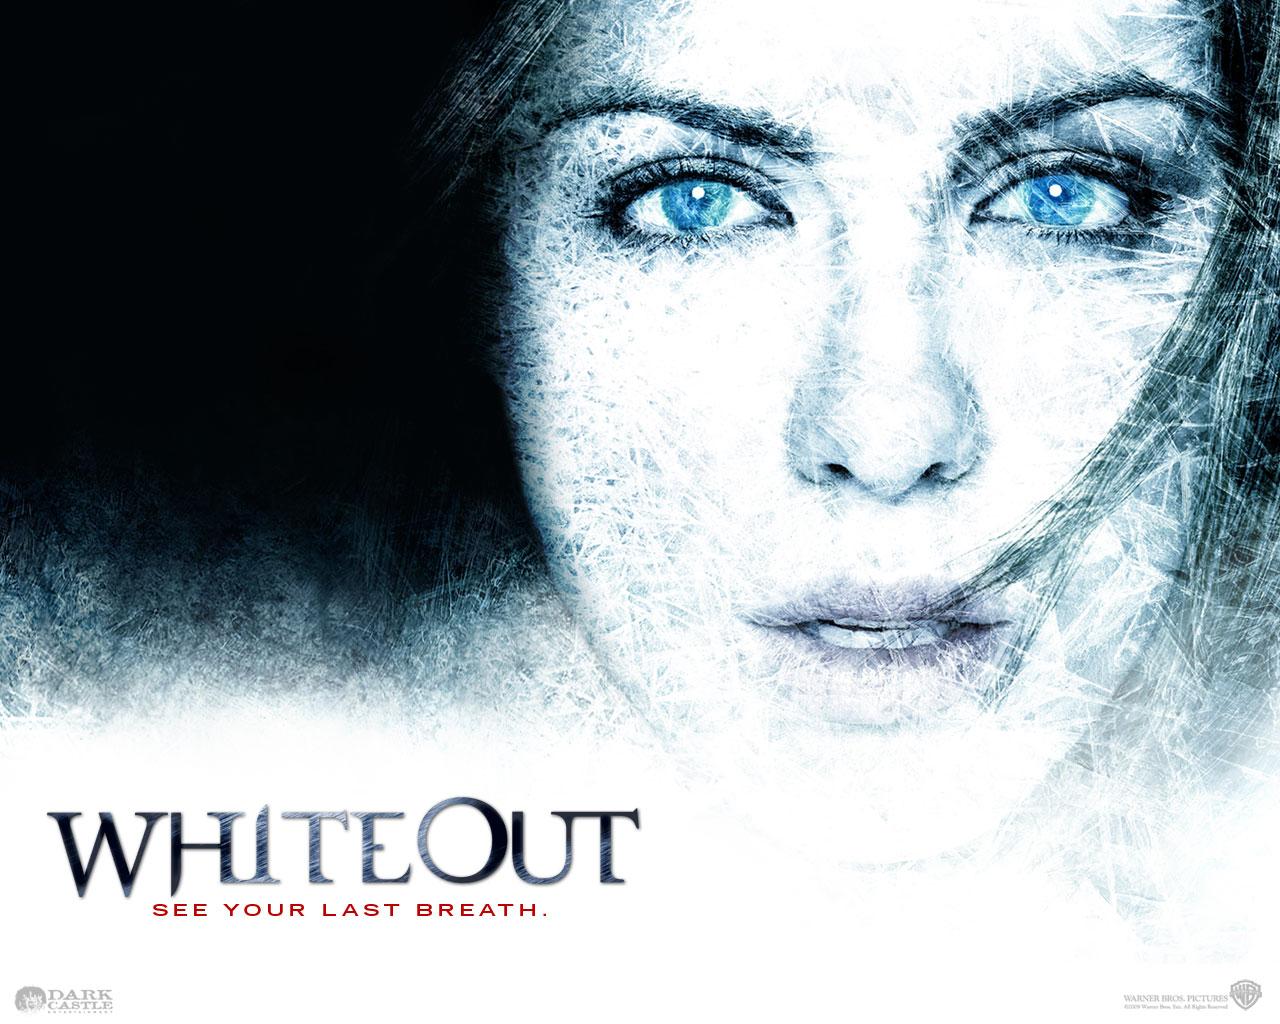 Whiteout Movie Poster Whiteout Movie Poster Whiteout